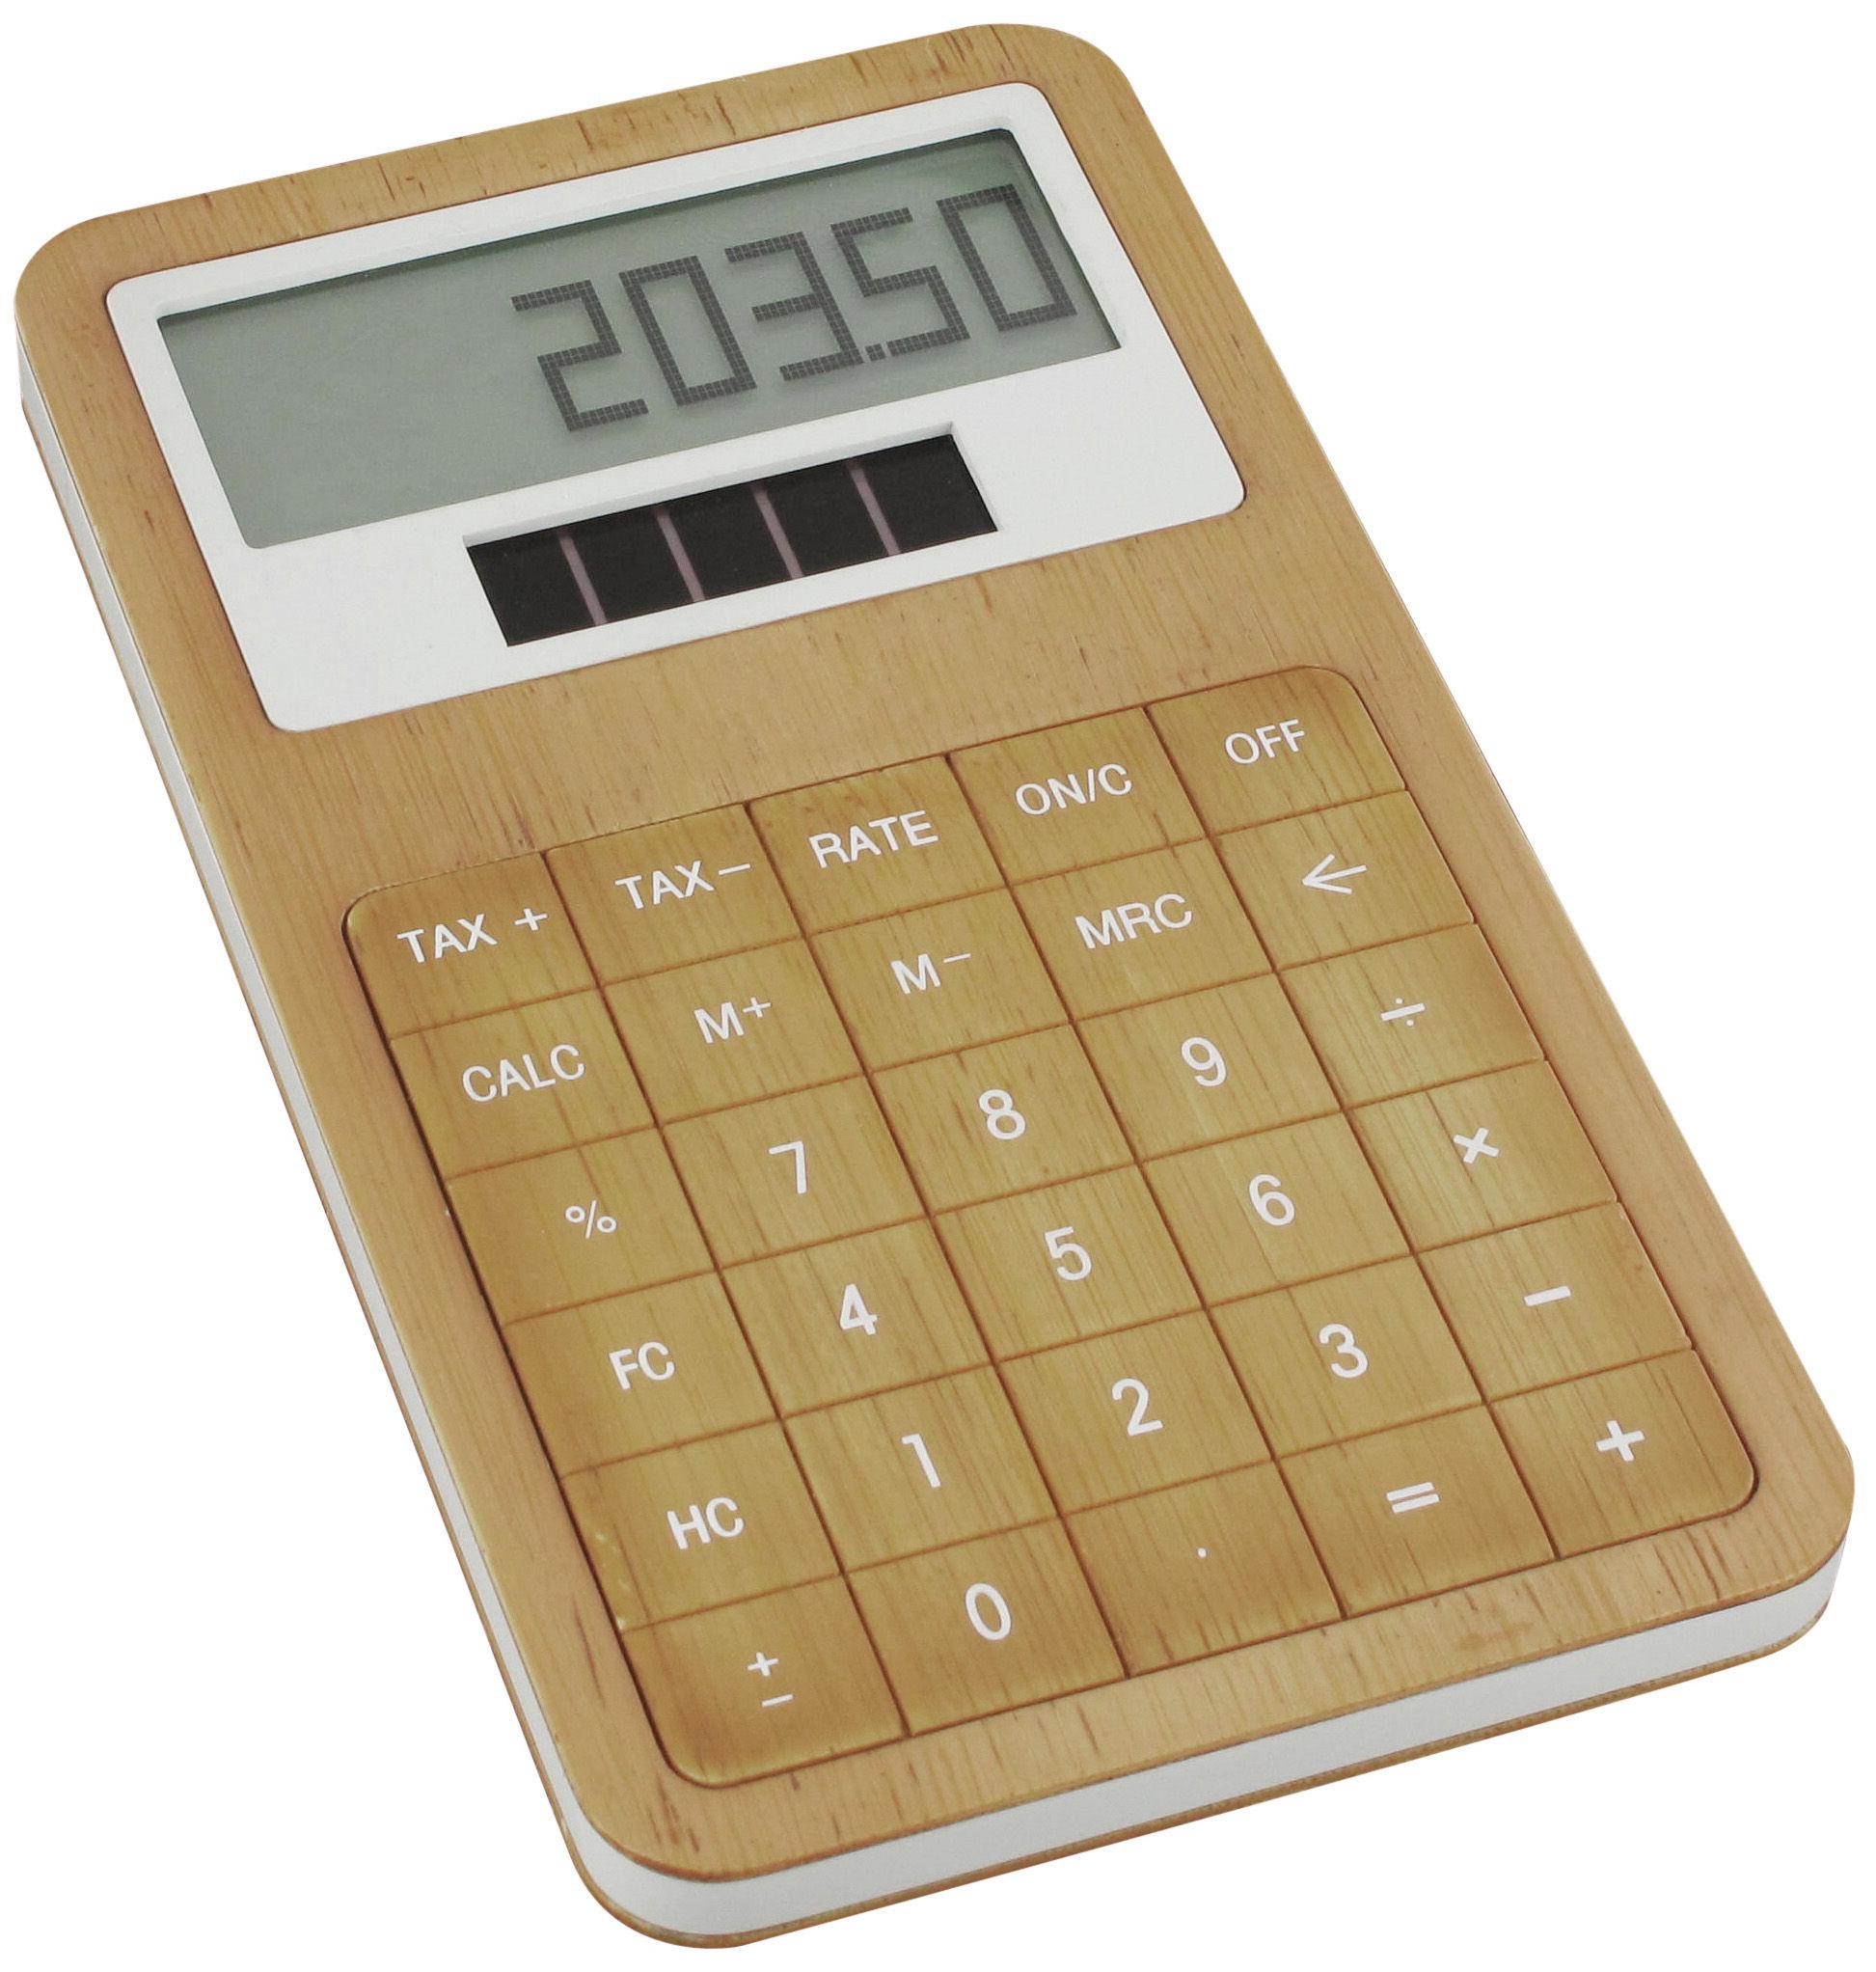 Decoration - Office - Safe Calculator by Lexon - Bamboo - Bamboo, Bioplastic